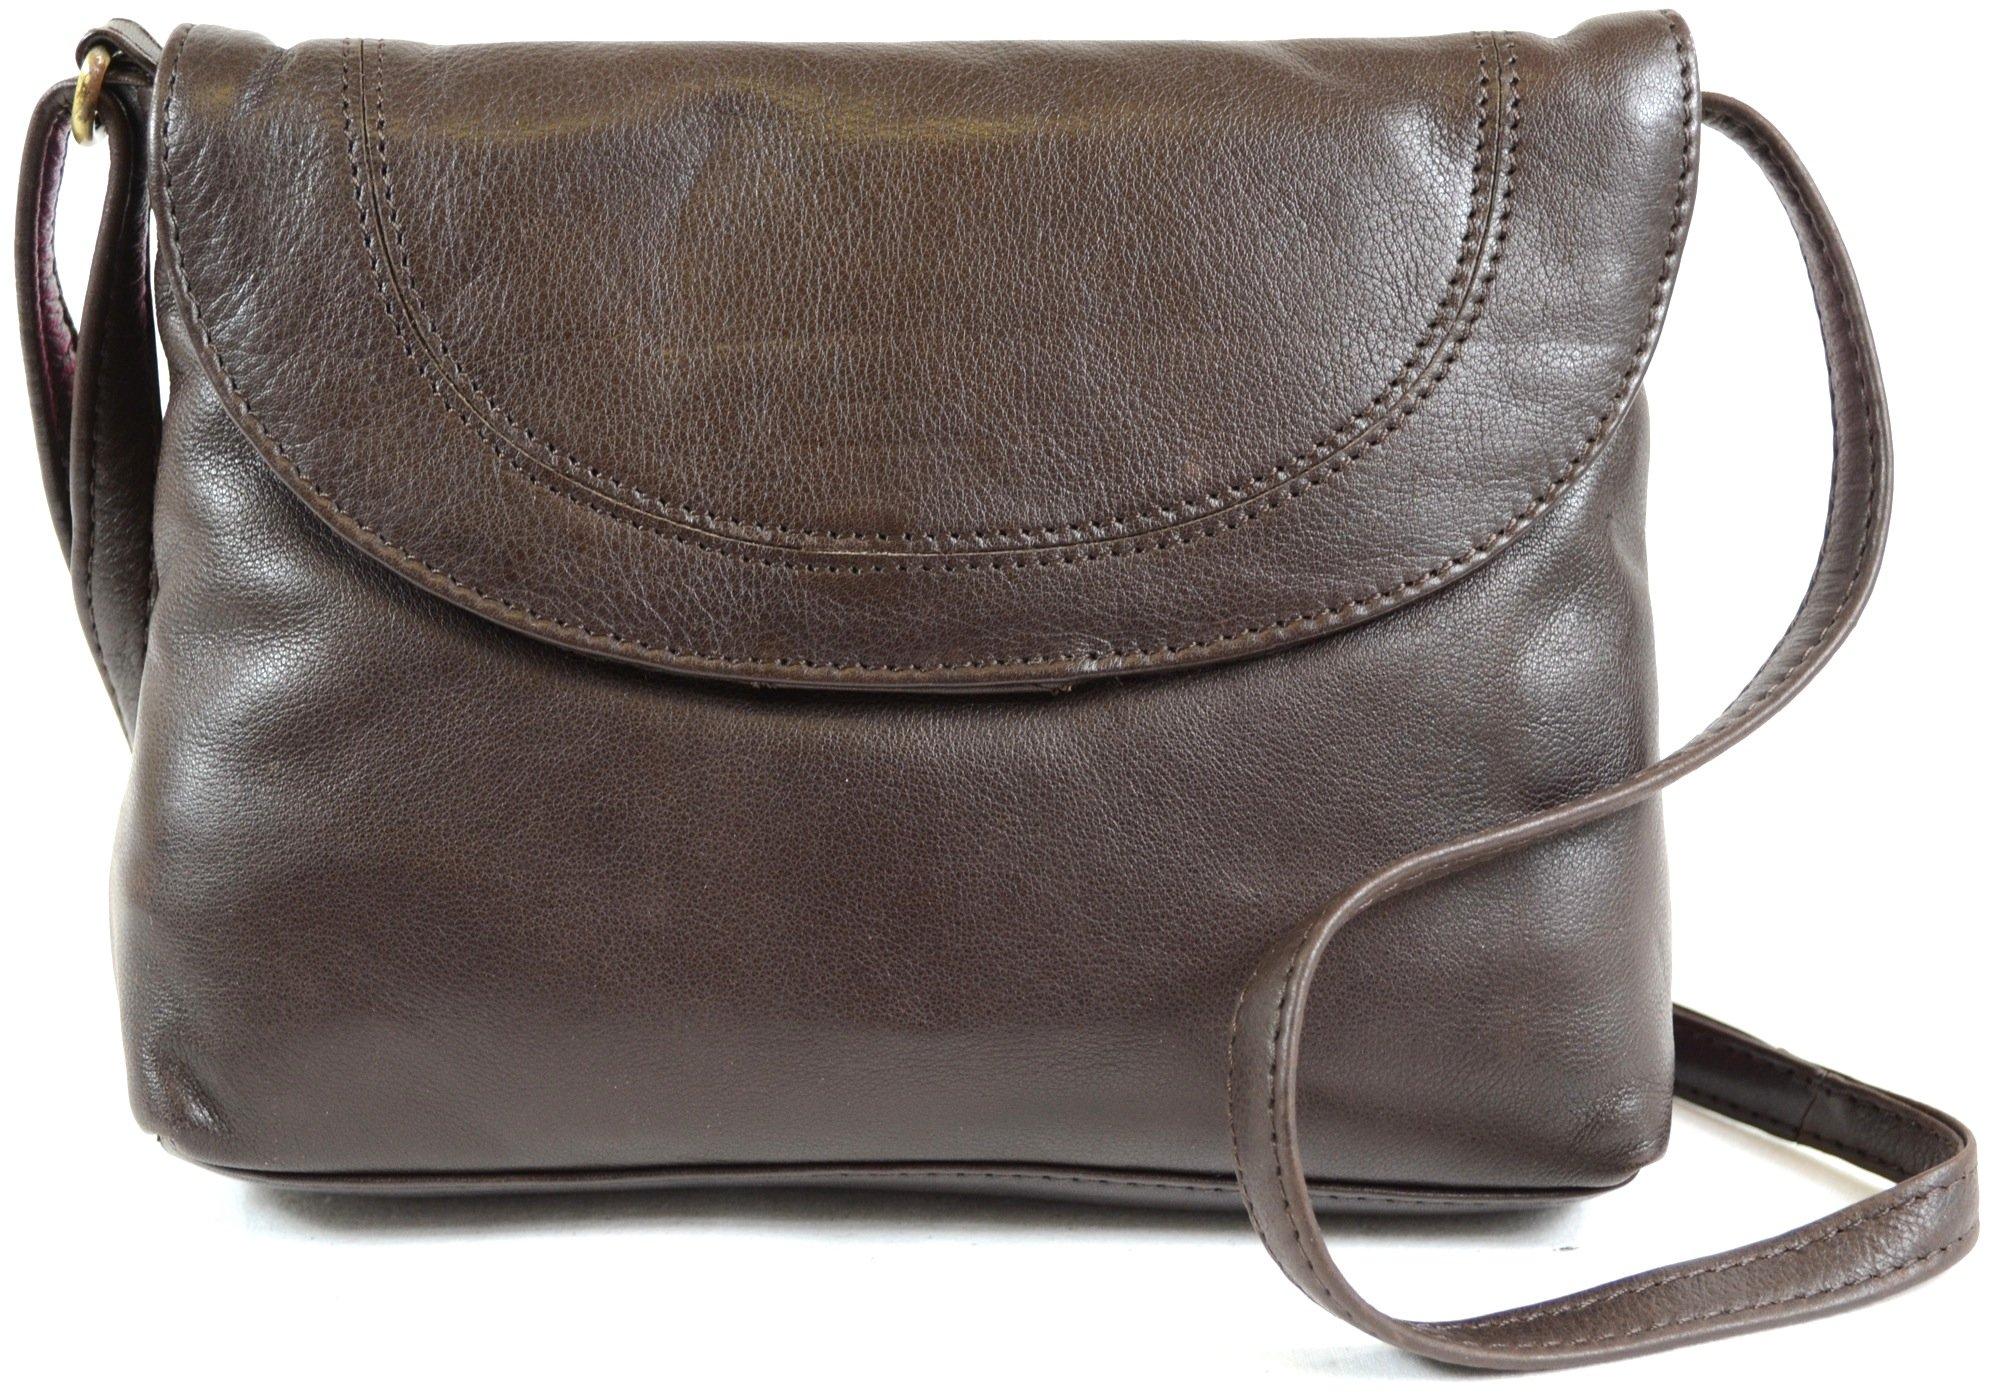 Ladies Soft Premium Leather Shoulder/Cross Body Bag (Brown)